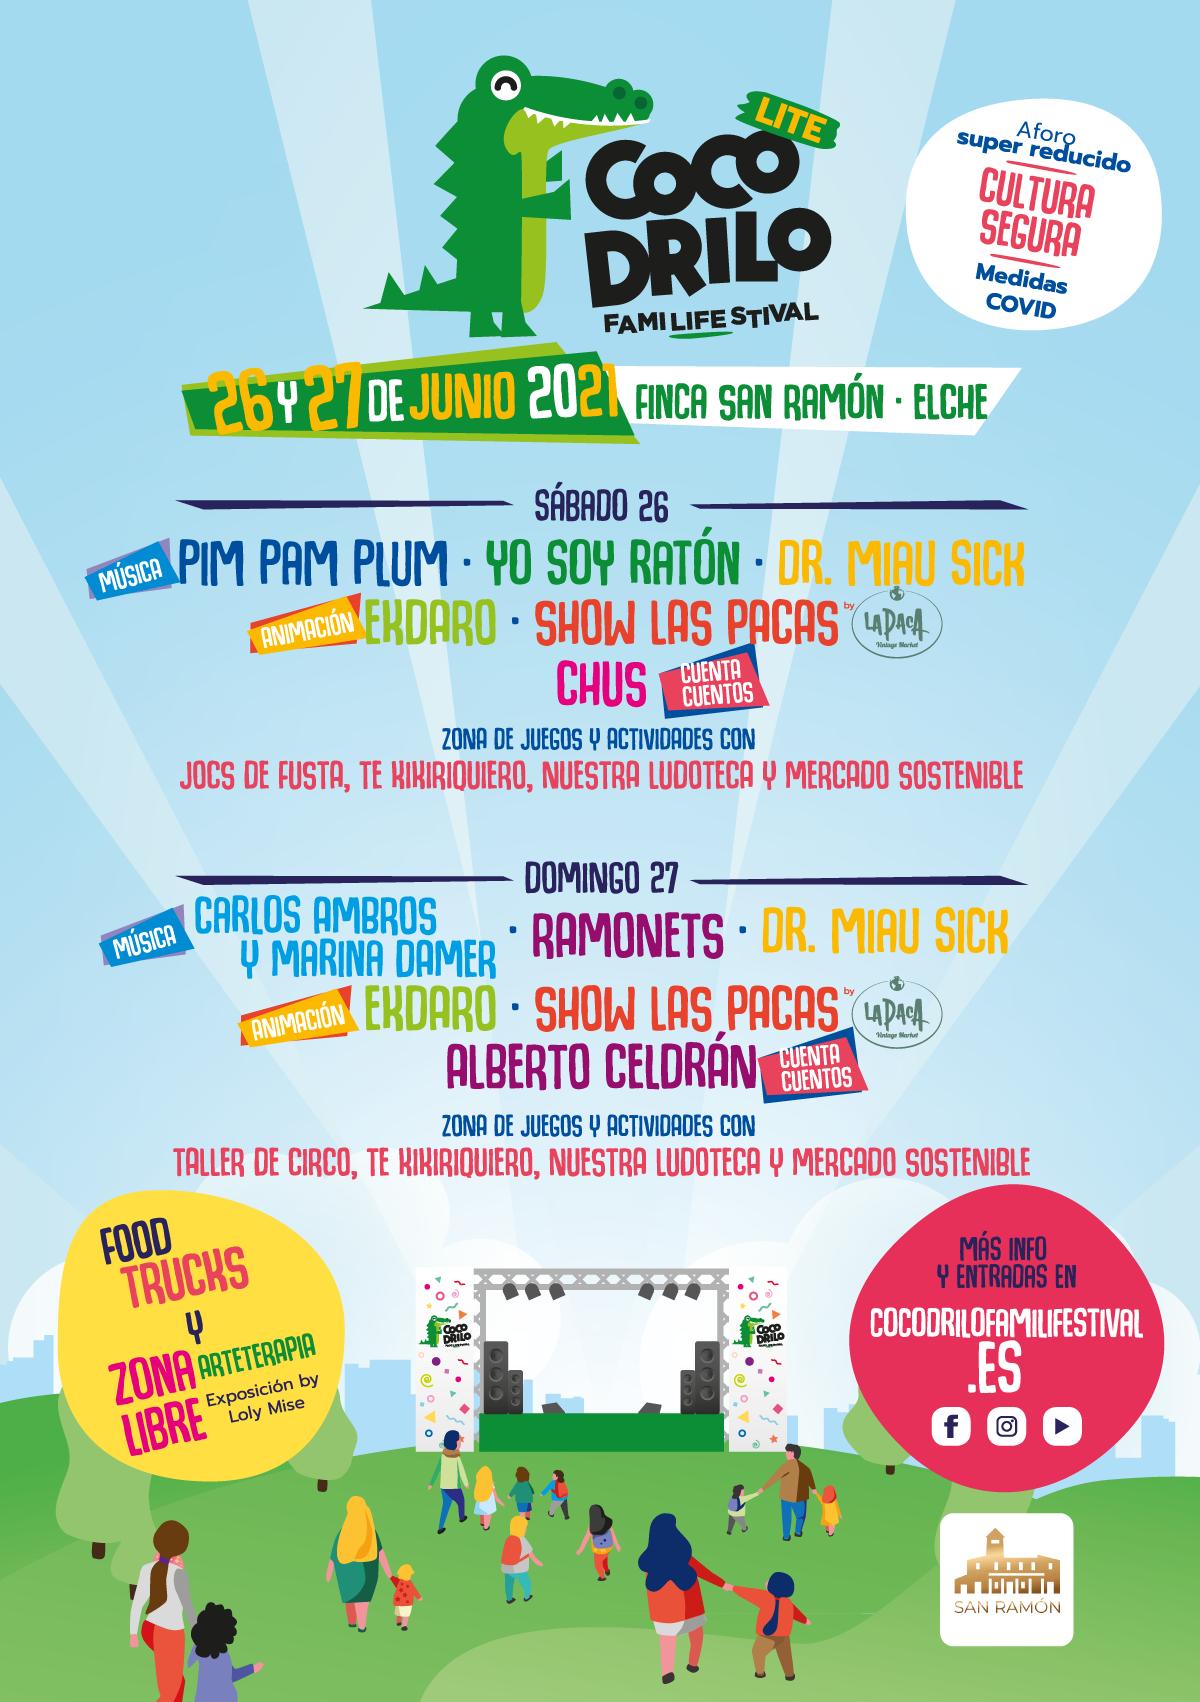 cartel cocodrilo familifestival 2021 ocio infantil de calidad